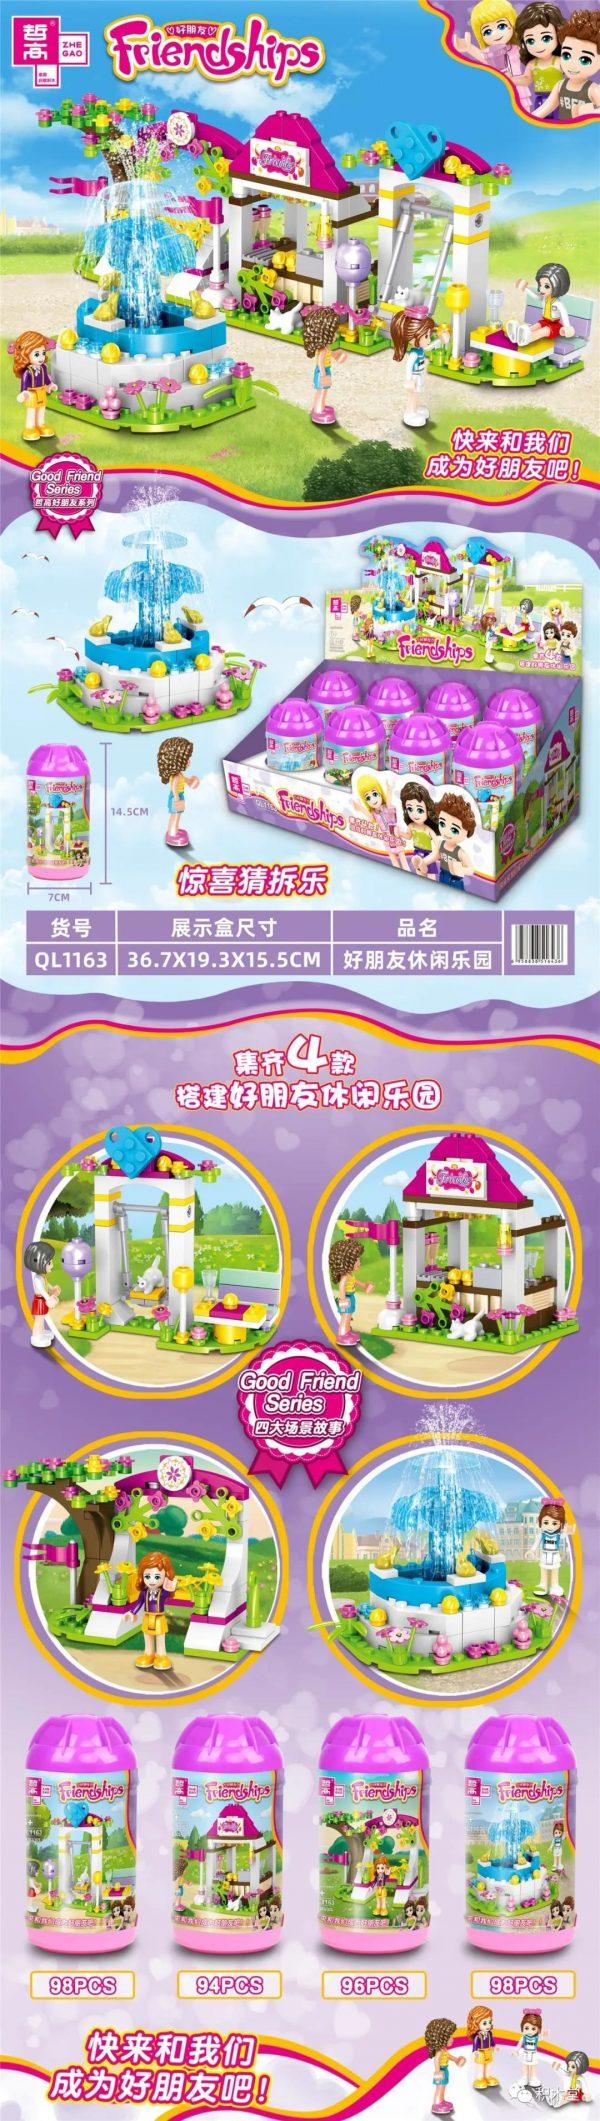 ZHEGAO QL1163 Good friends: Leisure Park 4 combinations 0